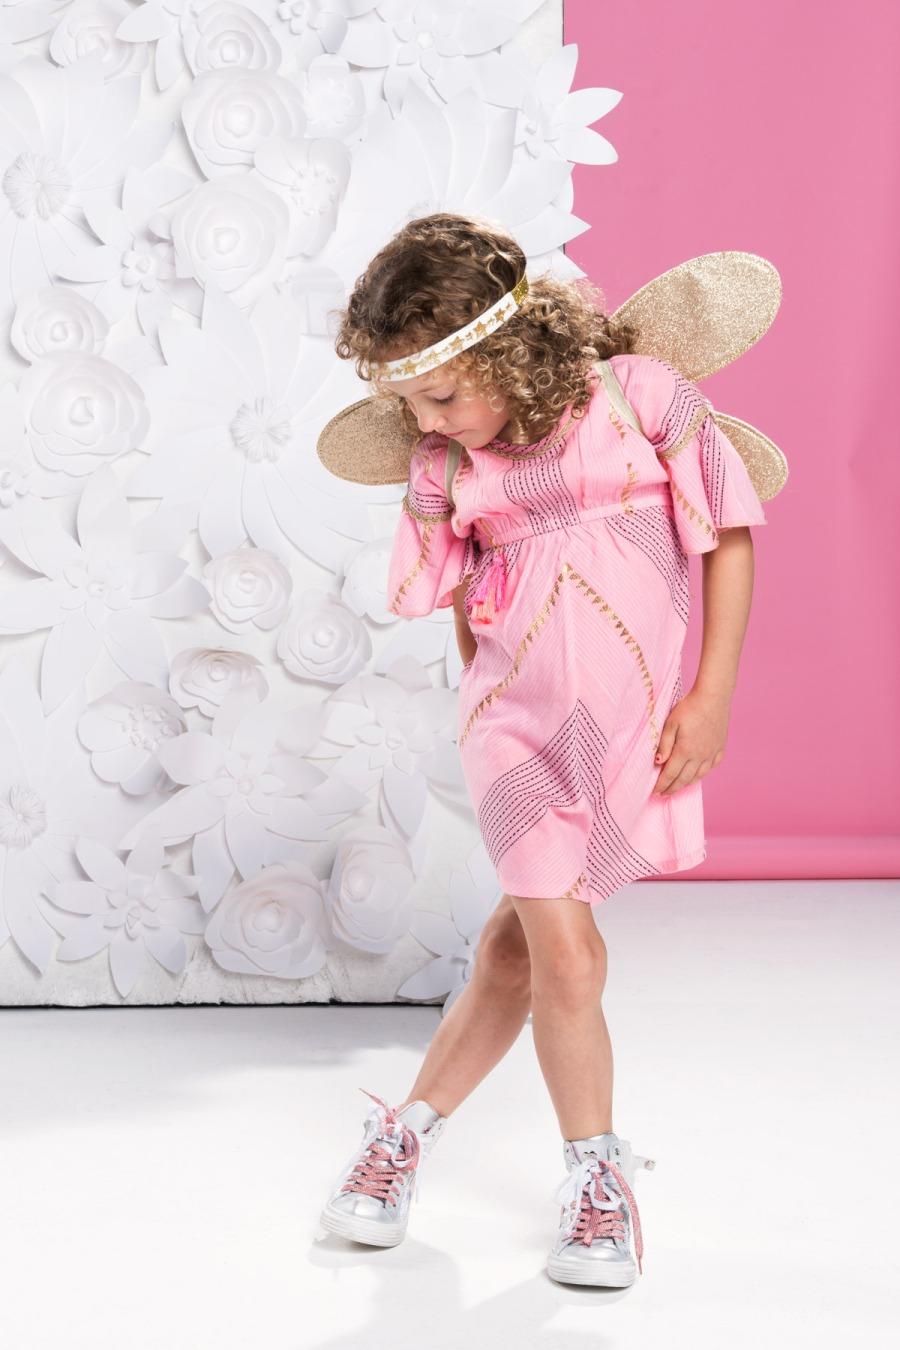 roze-jurkjes-MimPi-puurvangeluk